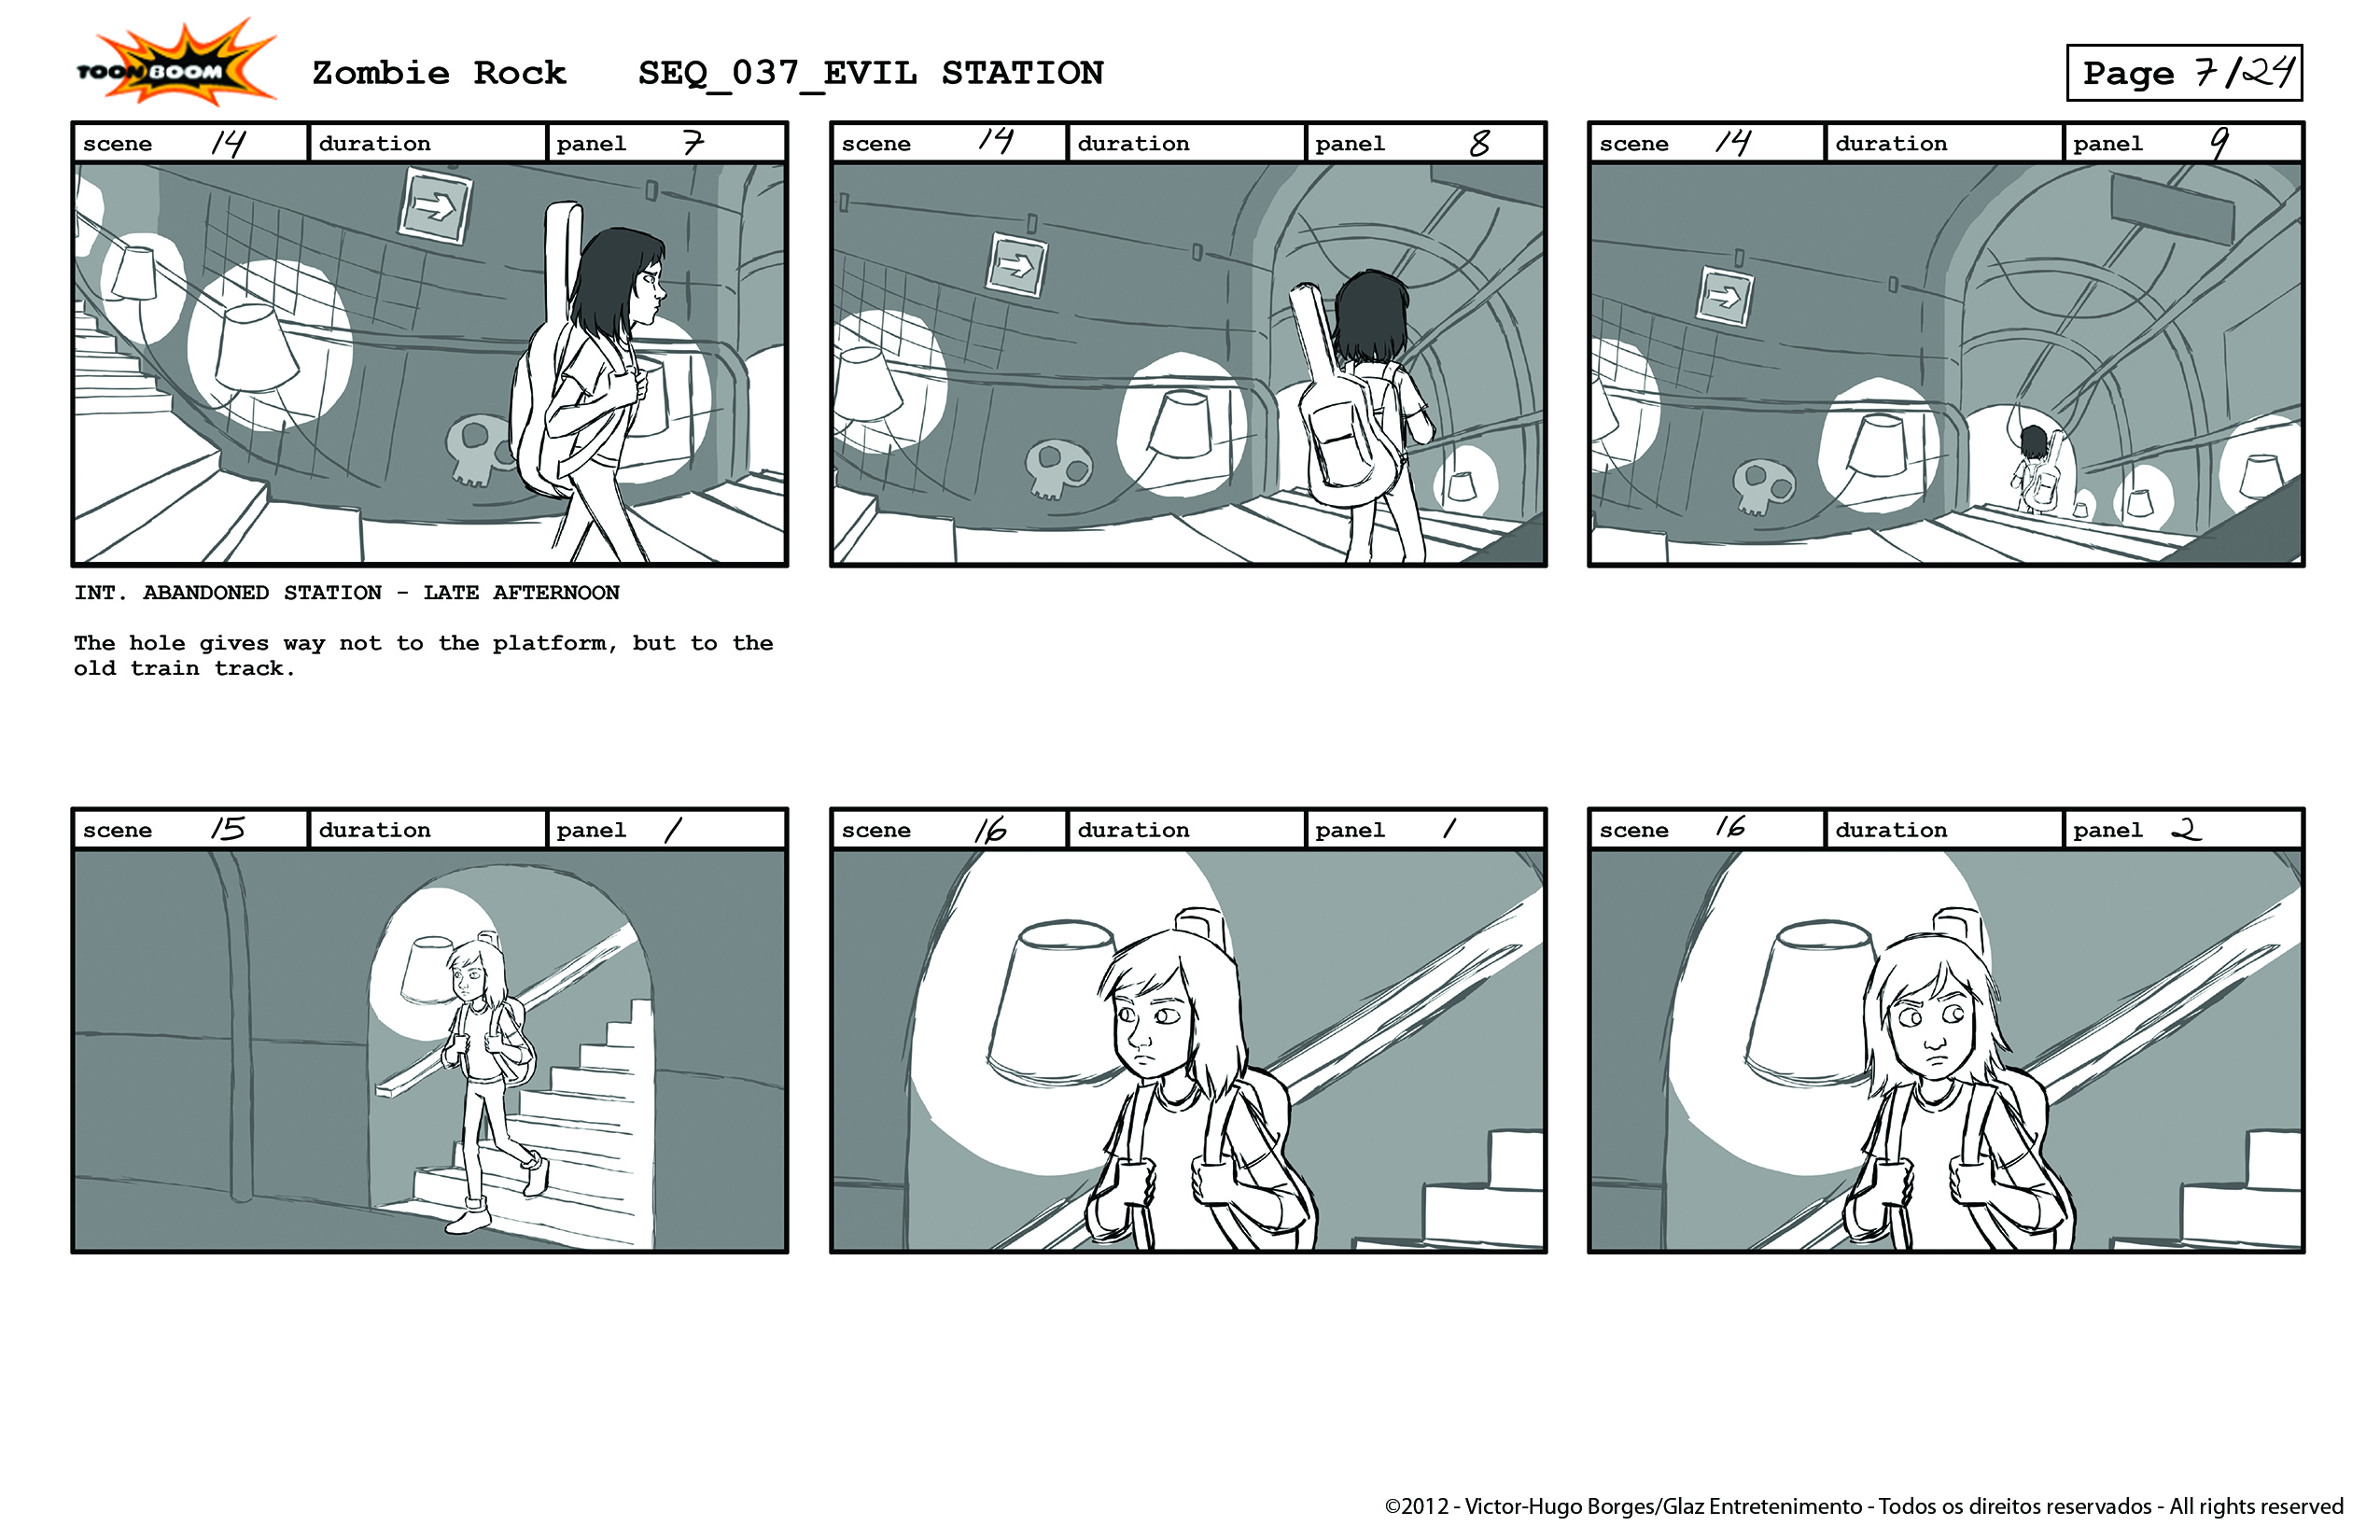 SEQ037_Evil Station_page07